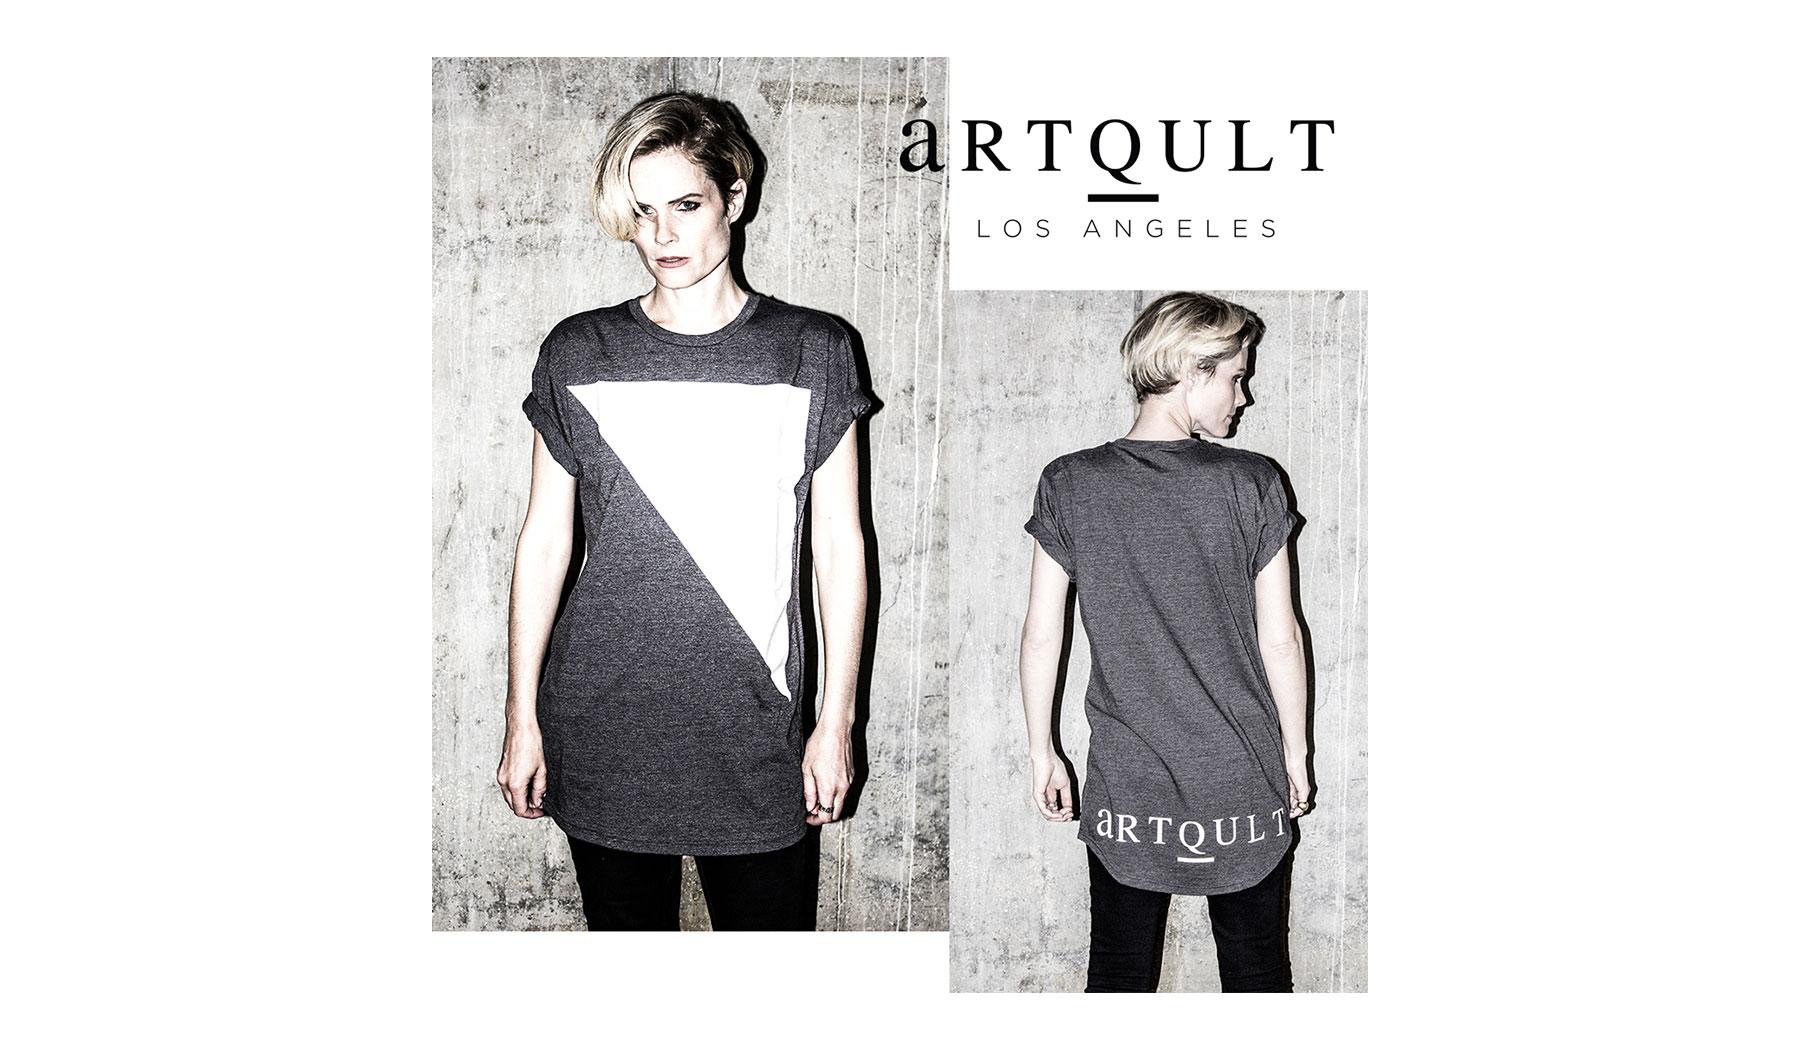 ARTQULT-LOS-ANGELES-LOOKBOOK-10.jpg